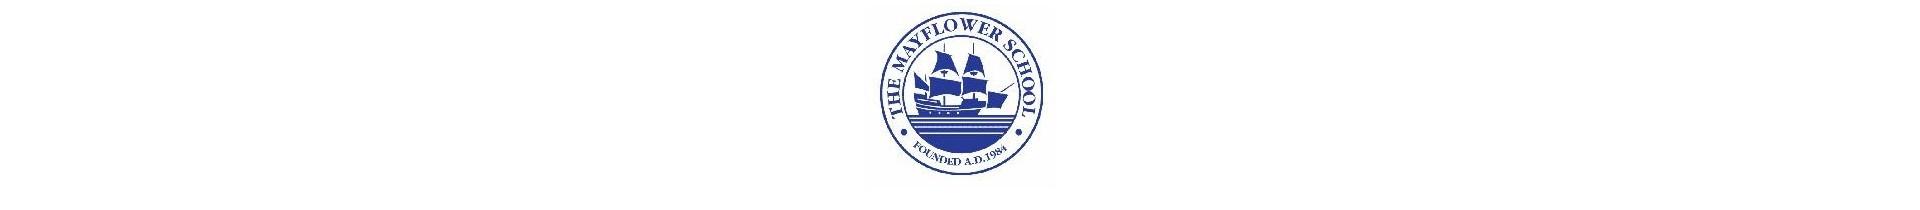 Colegio Mayflower